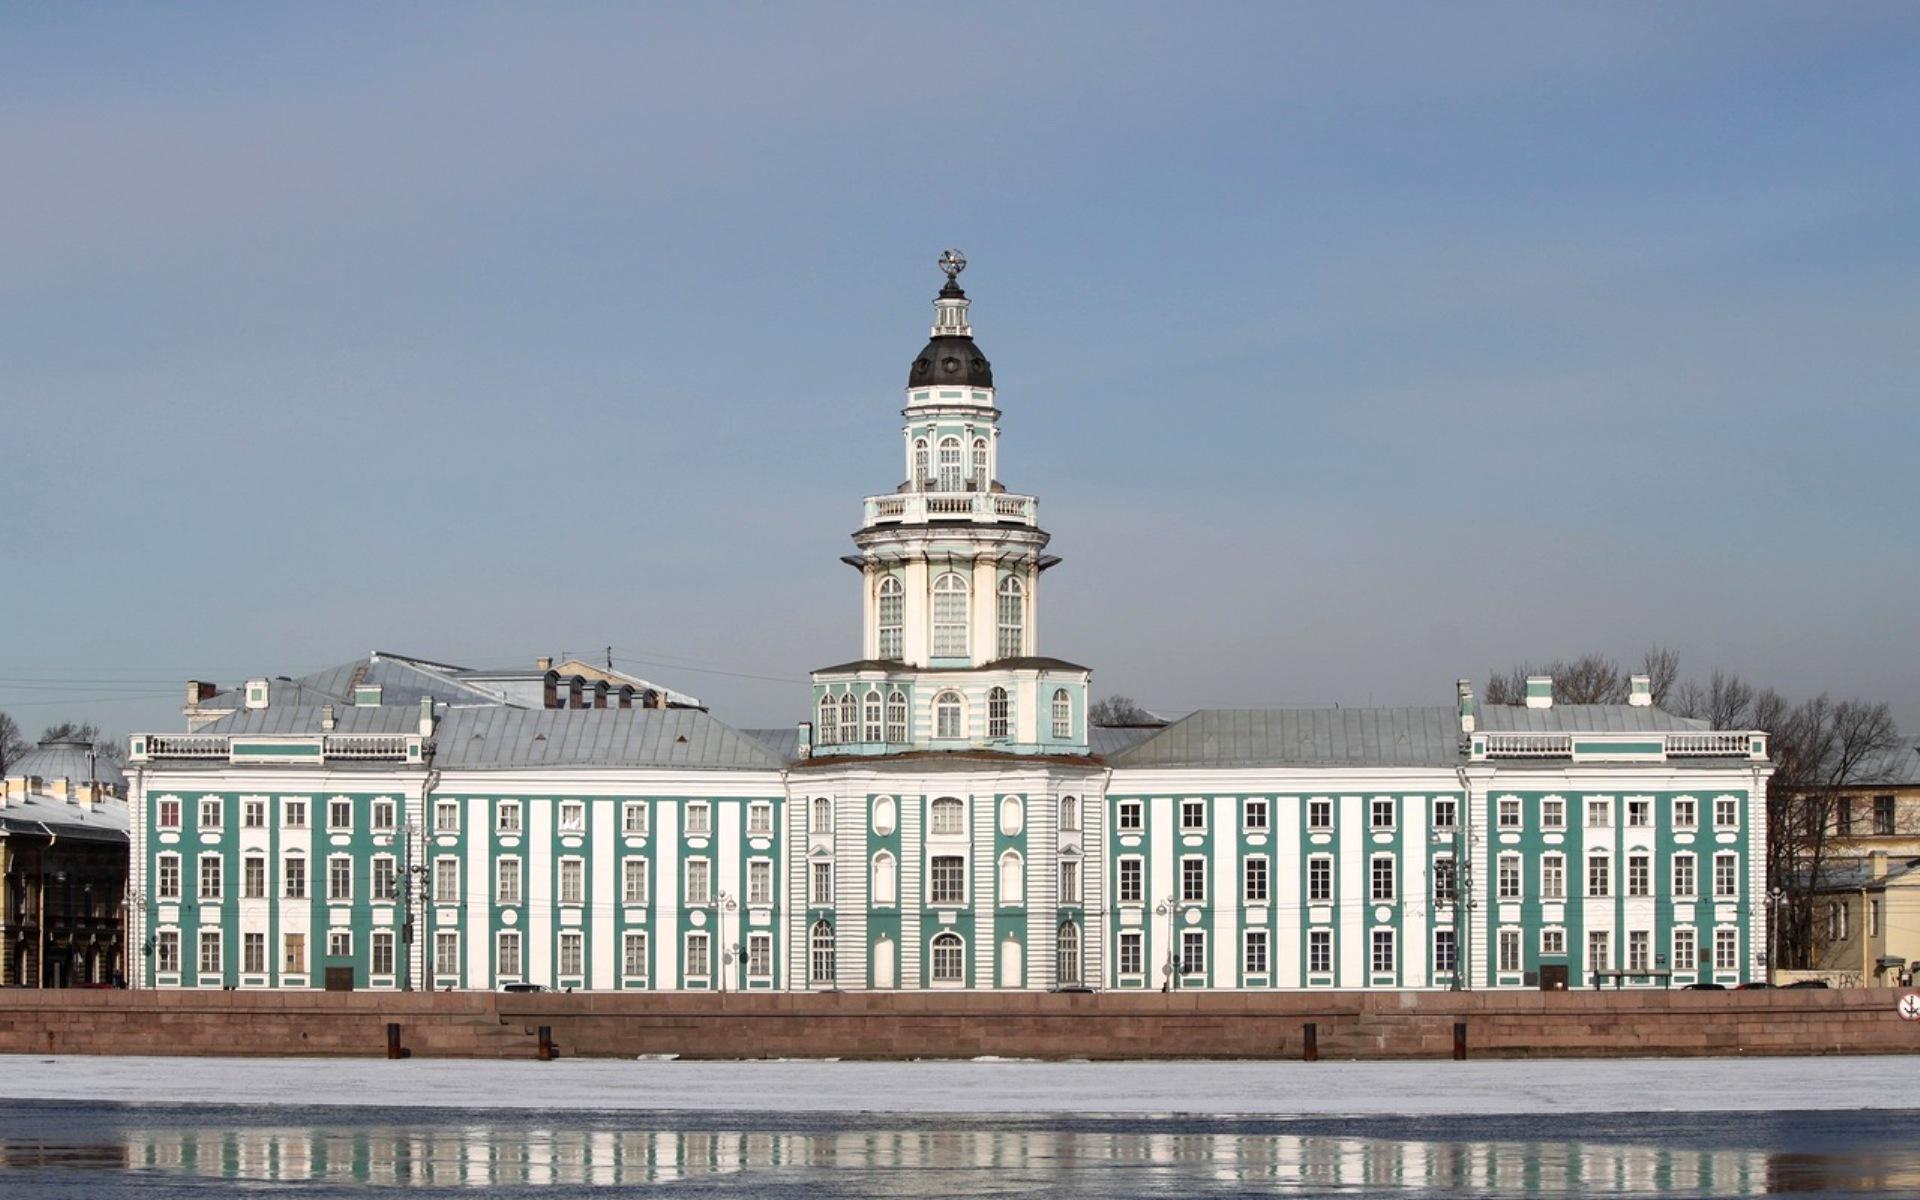 Картинка Кунсткамера - музей ...: www.kartinki24.ru/kartinki/muzei/18560.html